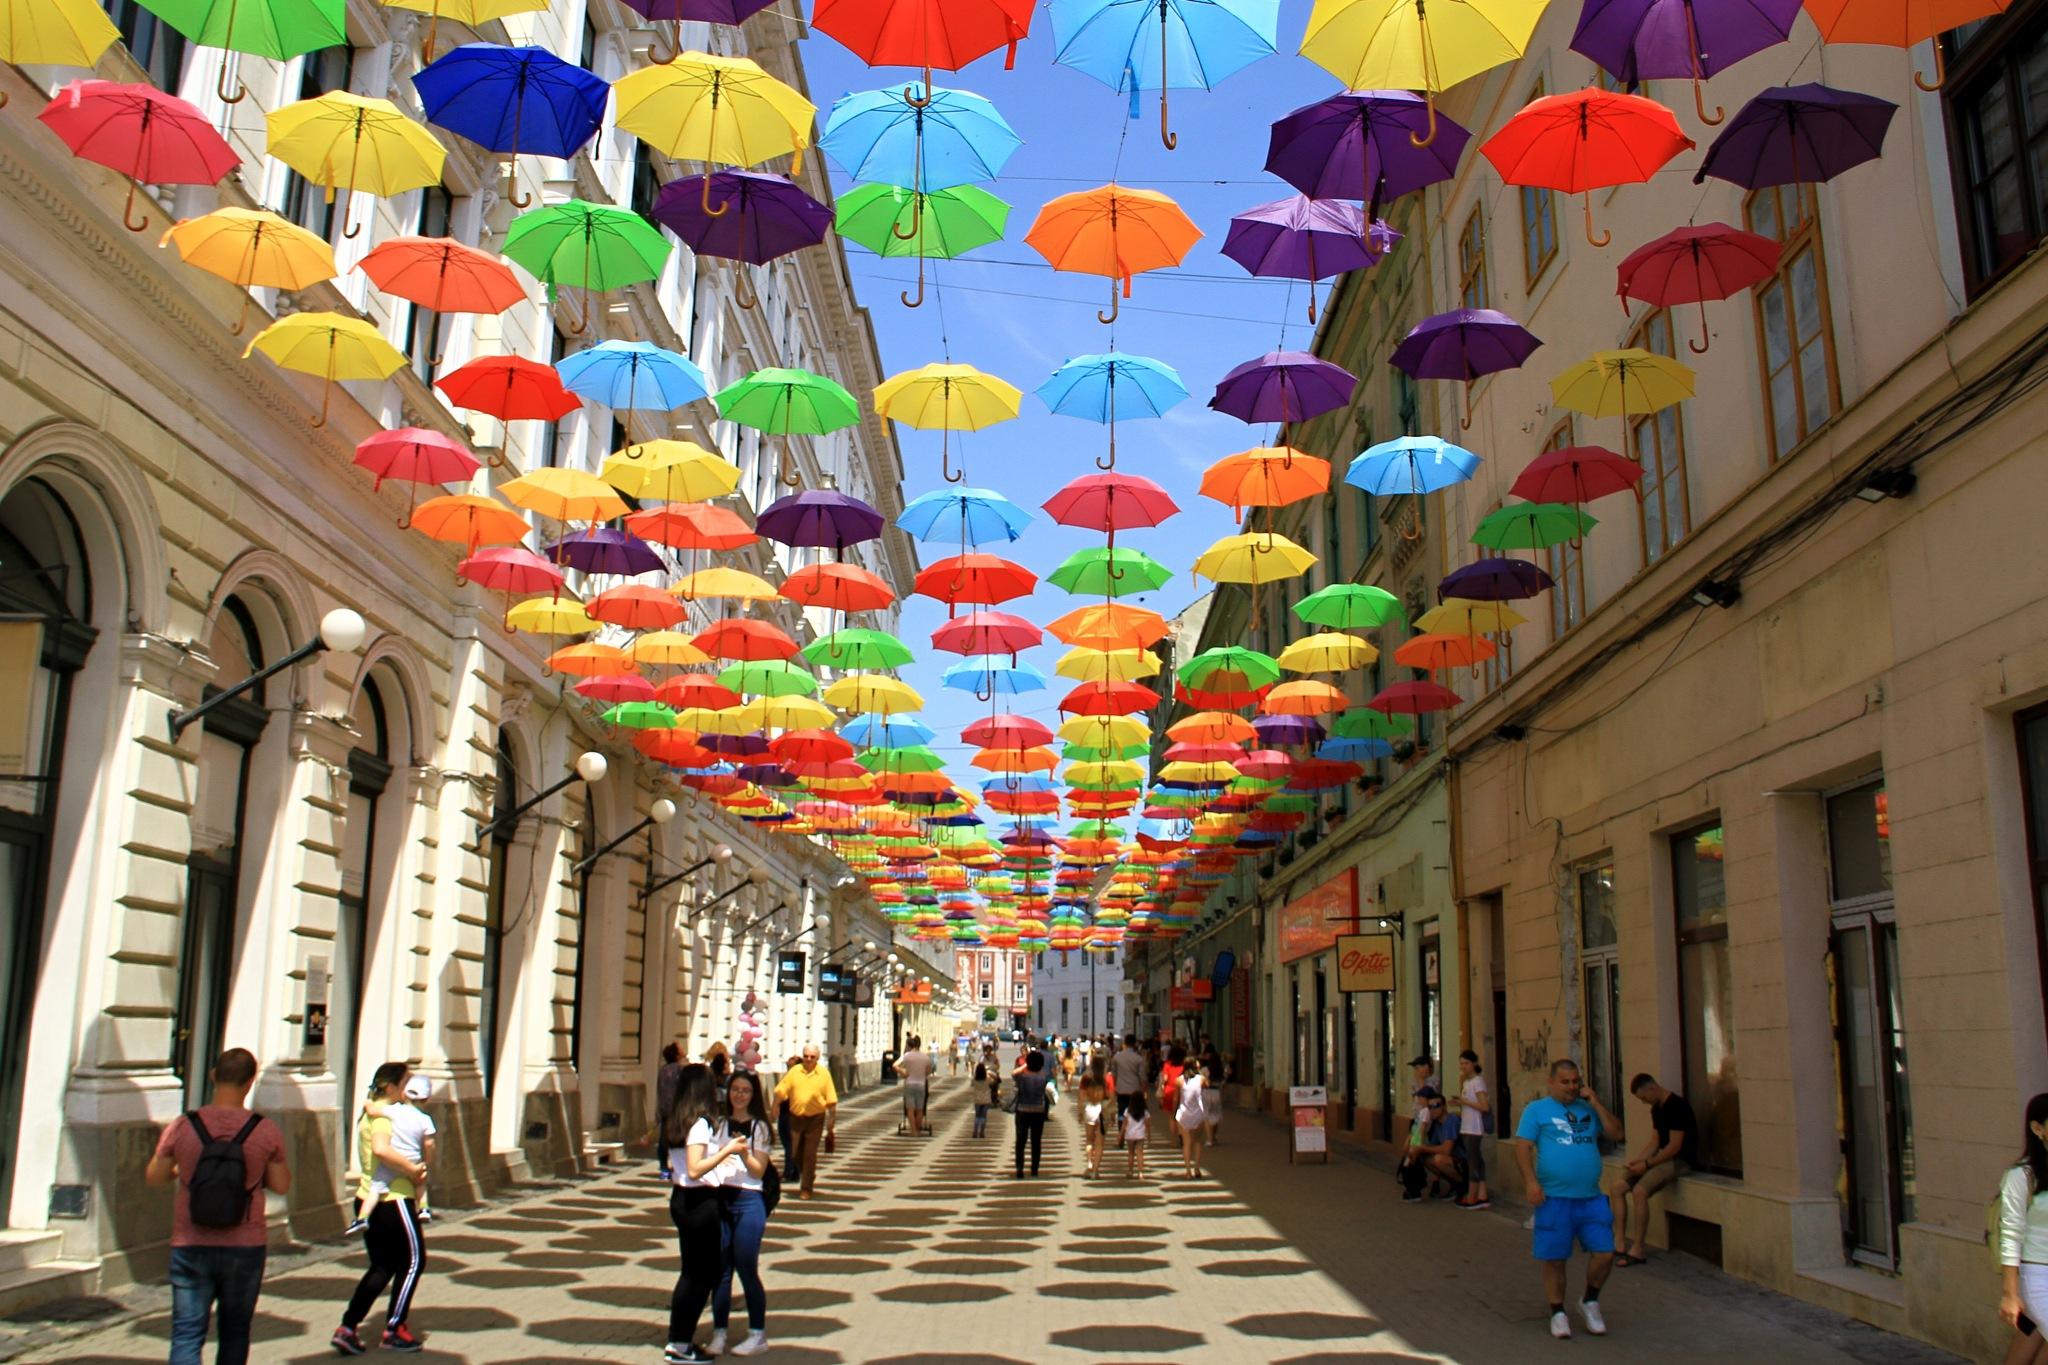 Umbrella street by martin_sebesta_